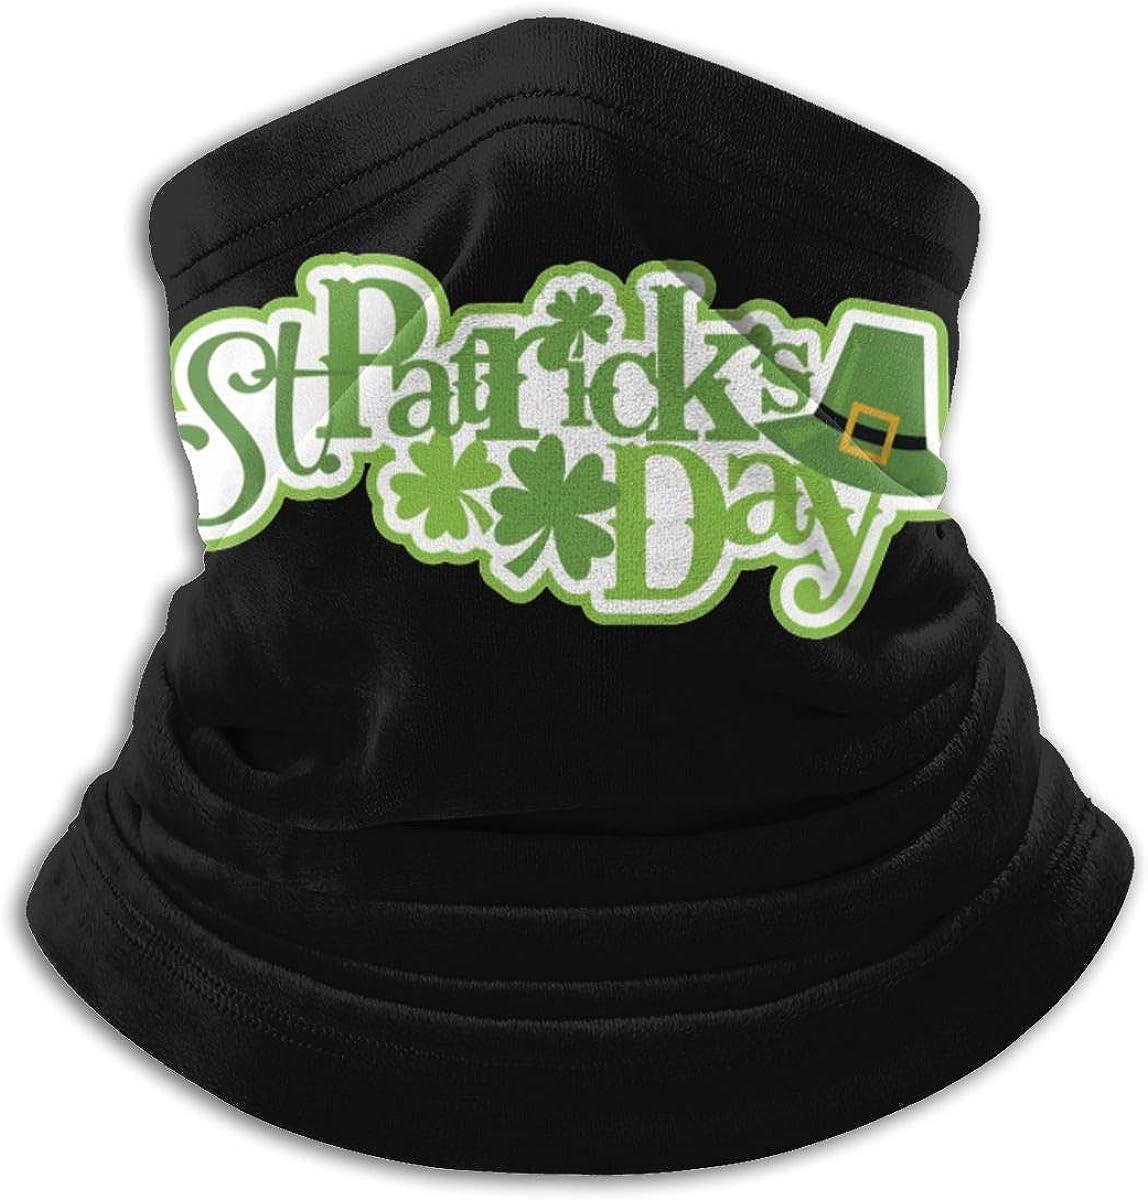 St. Patrick's Day Black Multi-function Neck Warmer Gaiter Polyester Neck Warmer Windproof Winter Neck Gaiter Cold Weather Scarf For Men Women